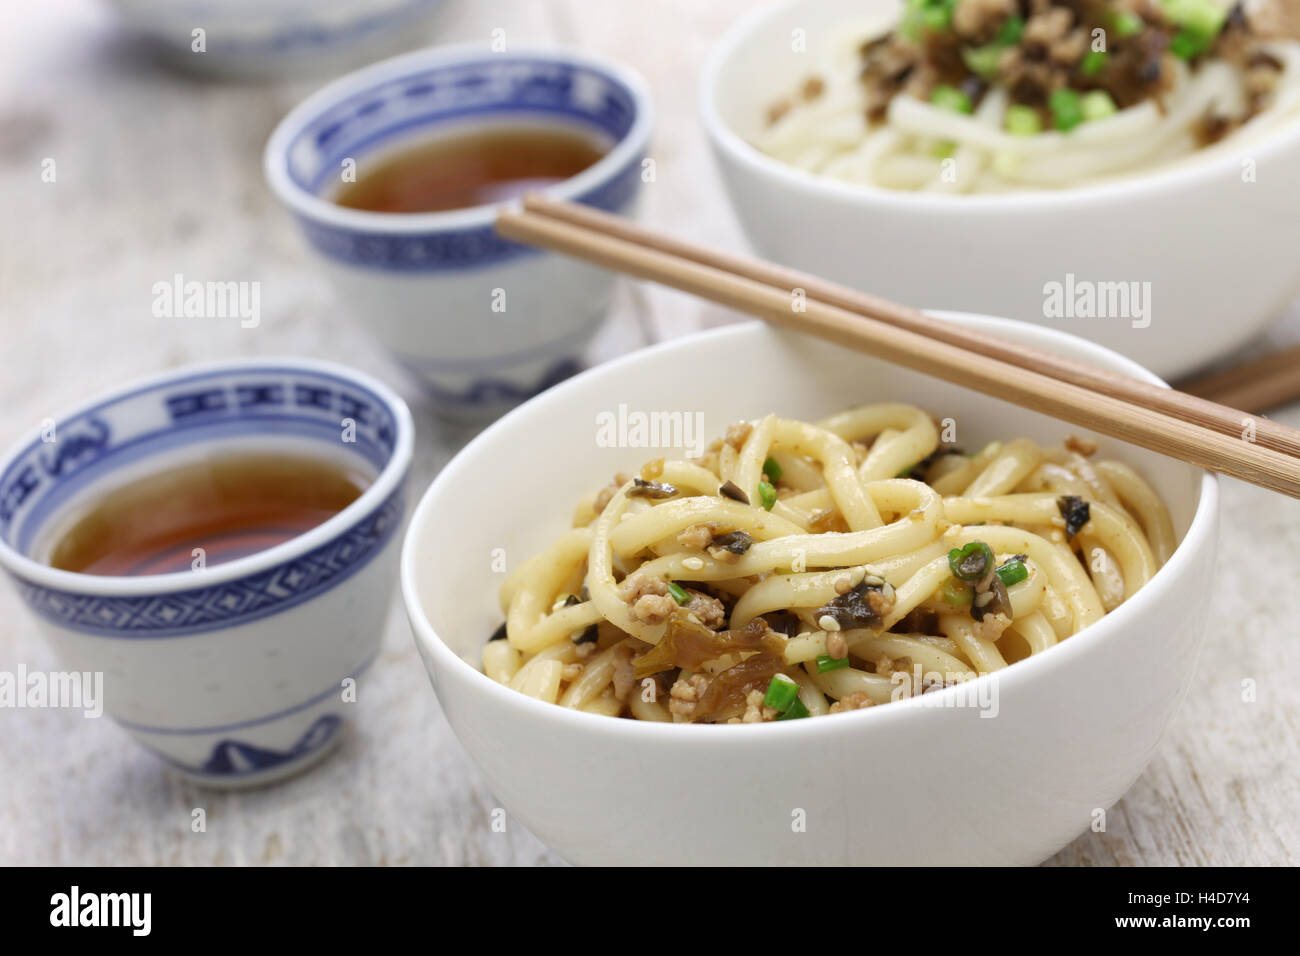 Dan dan, la cuisine du Sichuan nouilles chinoises Photo Stock